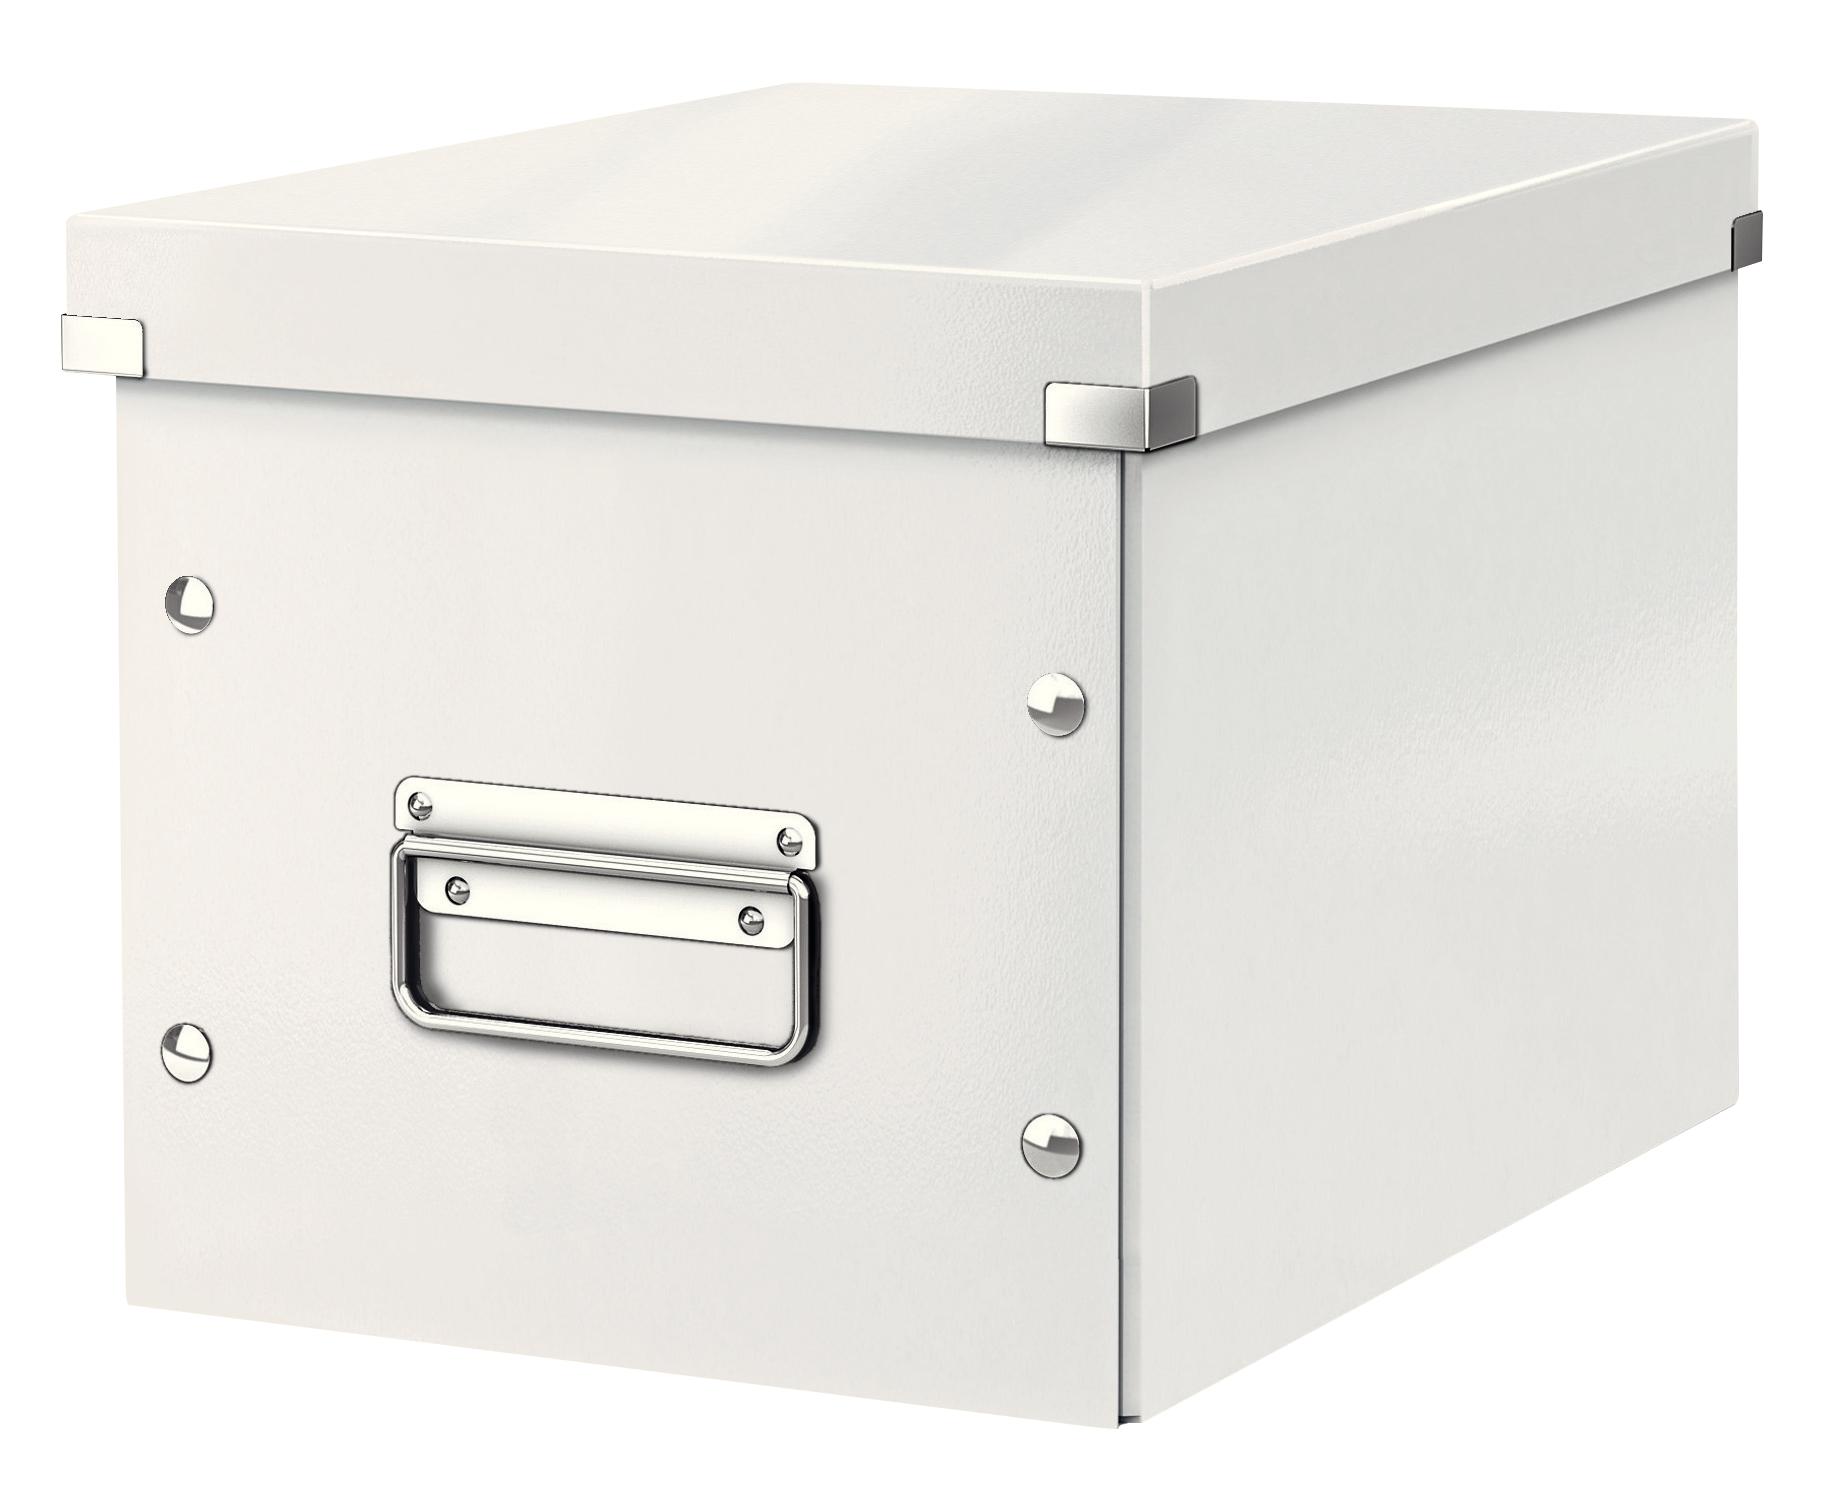 LEITZ Arkivboks Click & Store Cube Medium Hvit